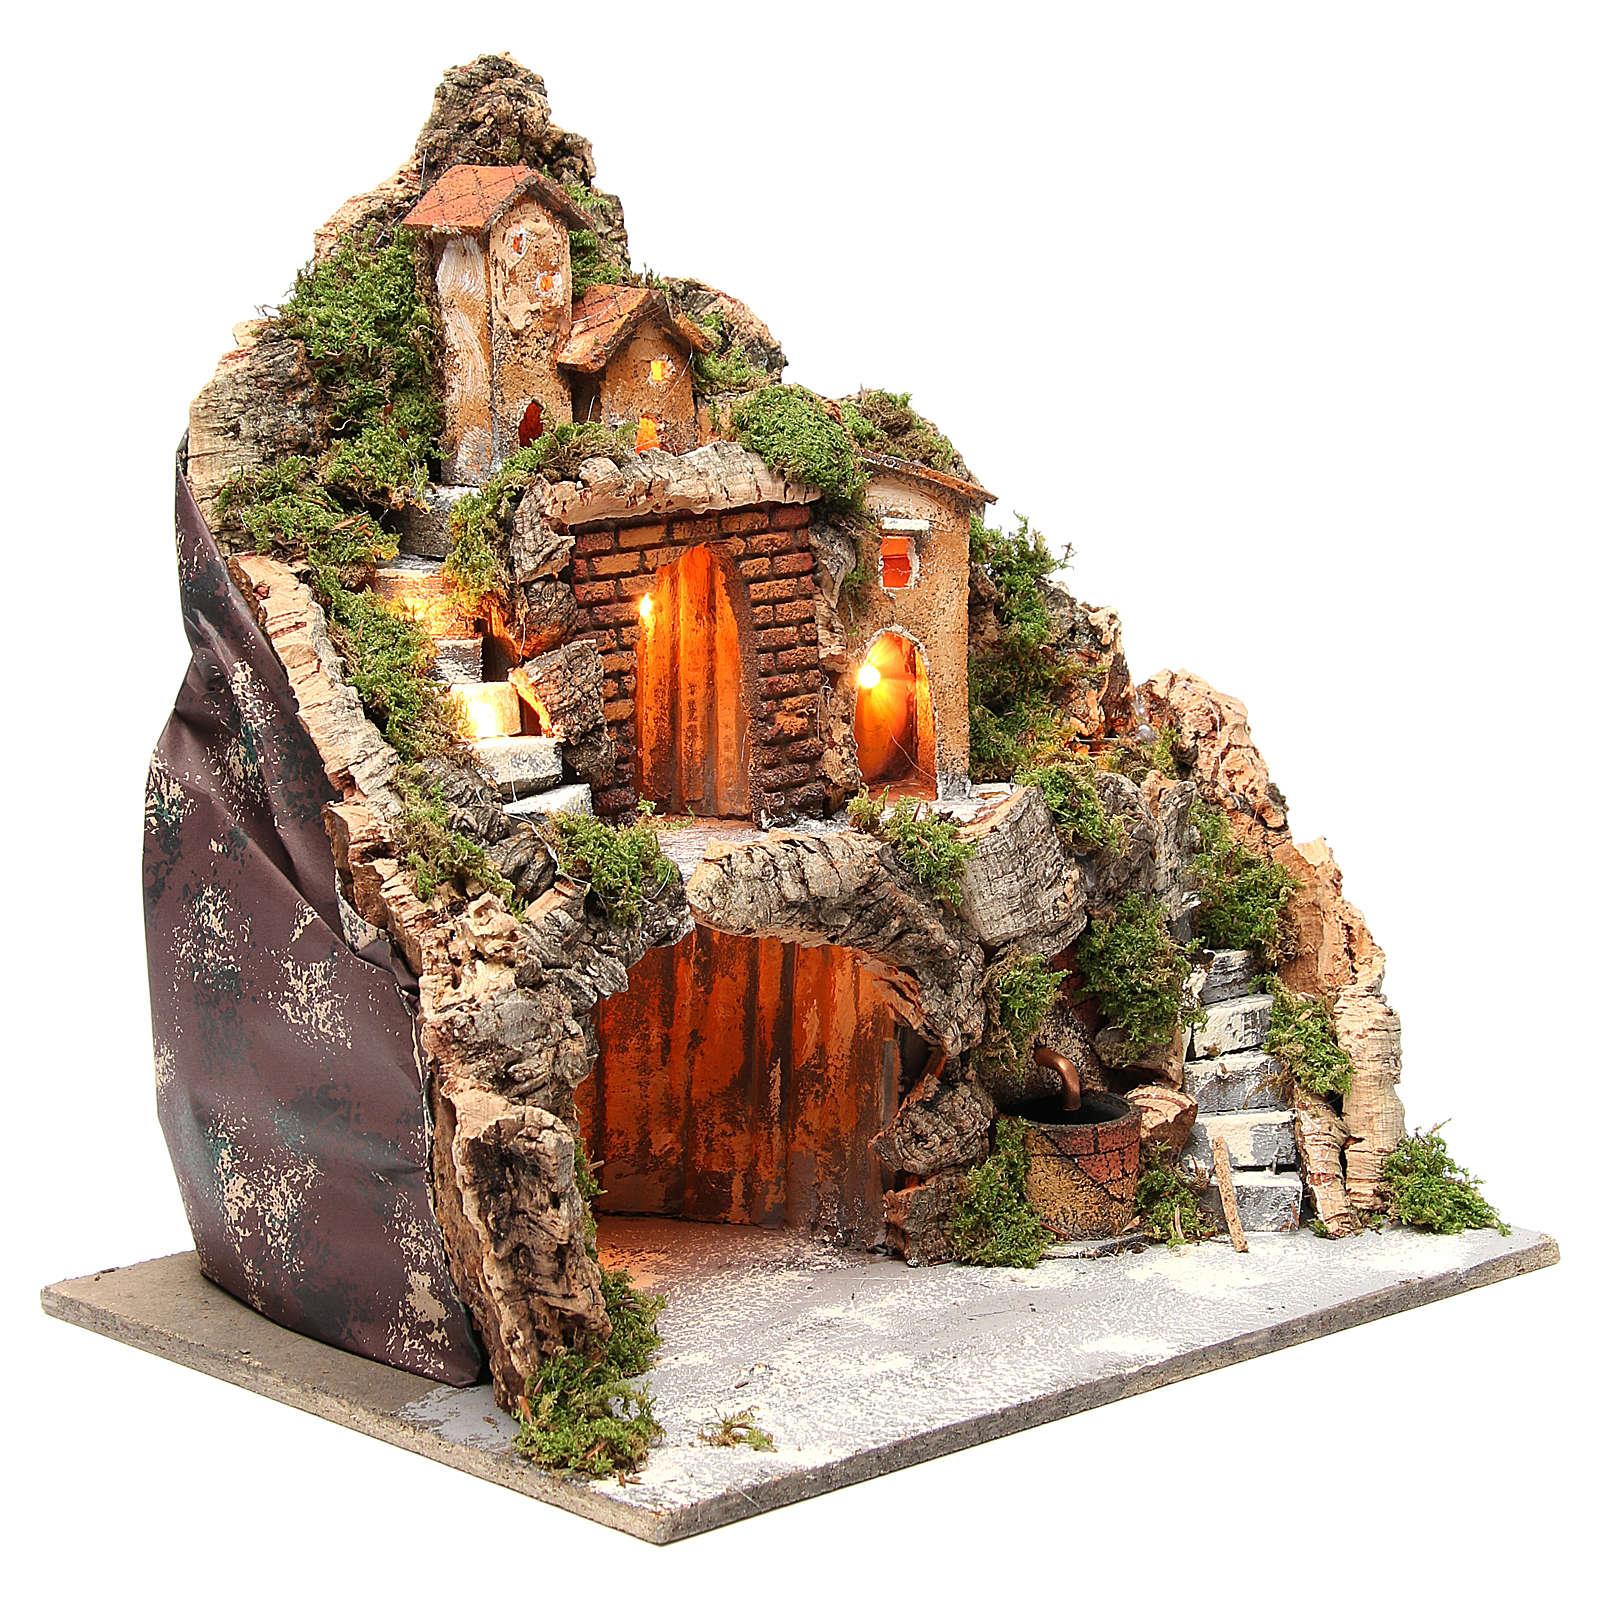 Capanna illuminata con borgo 40x40x30 con cascata e scalinata 4